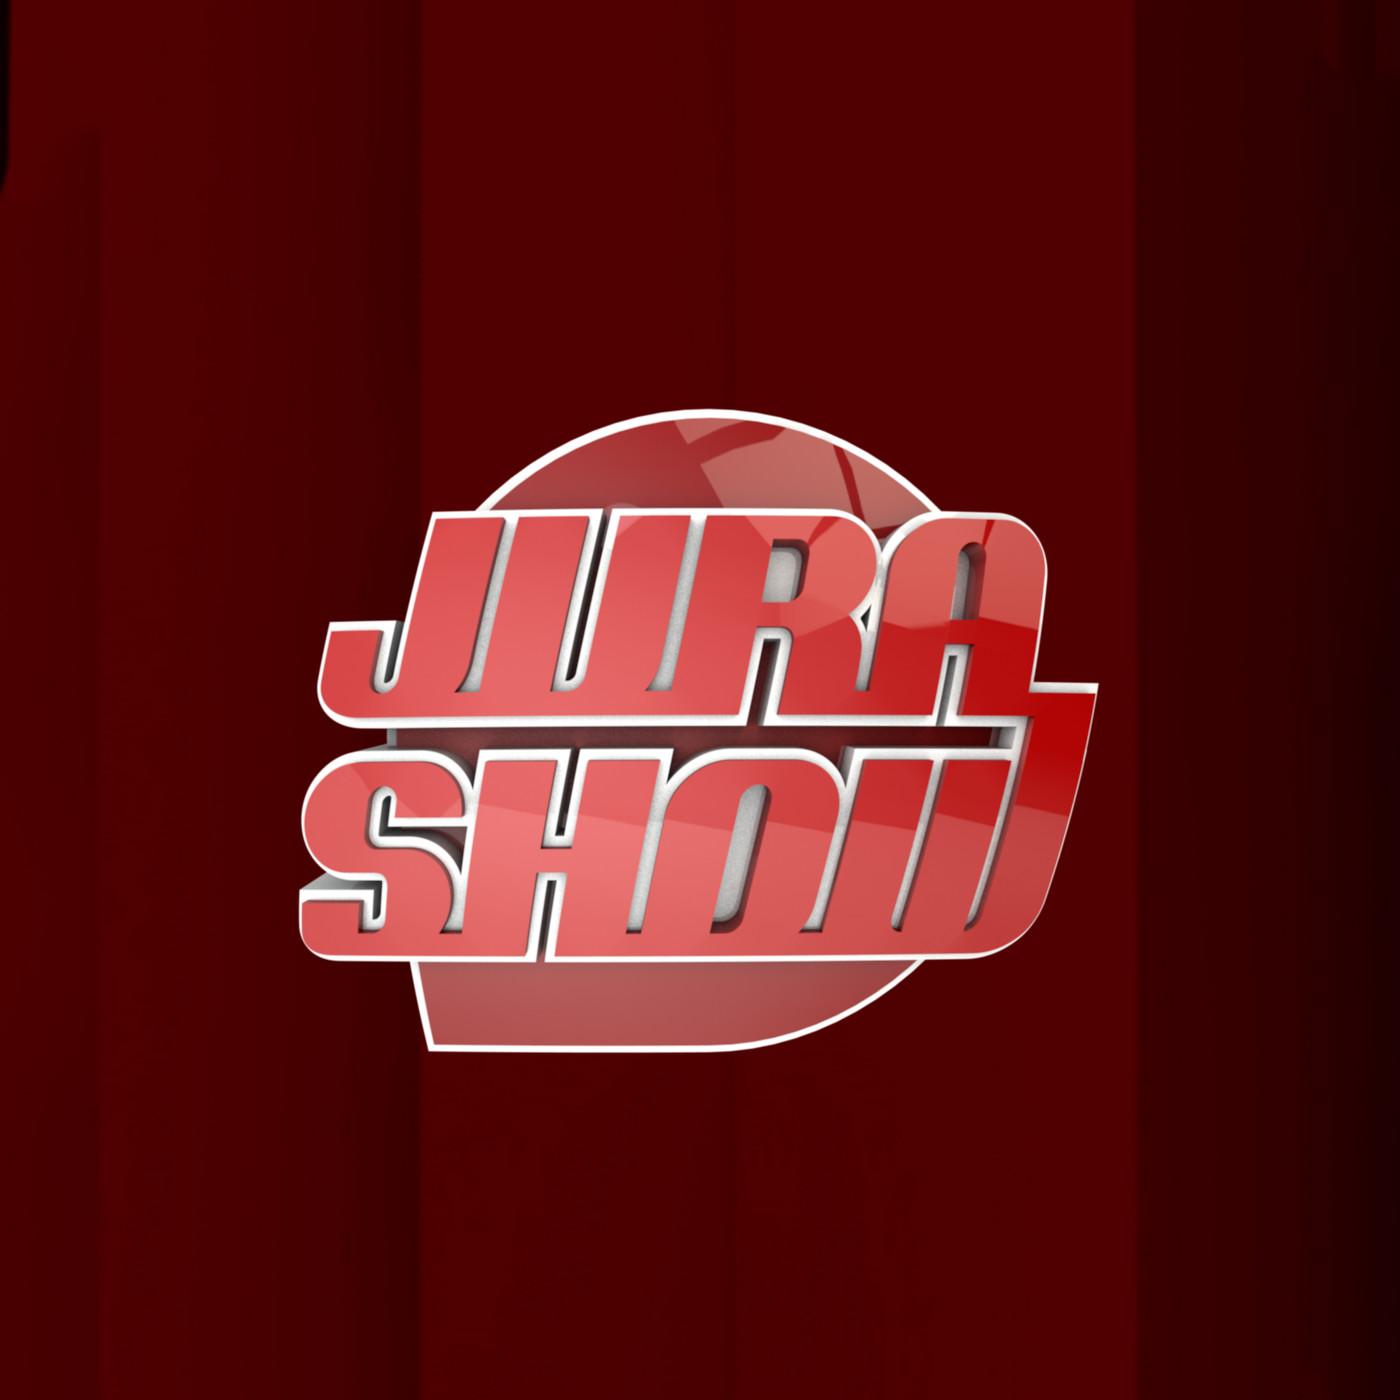 Jura Show